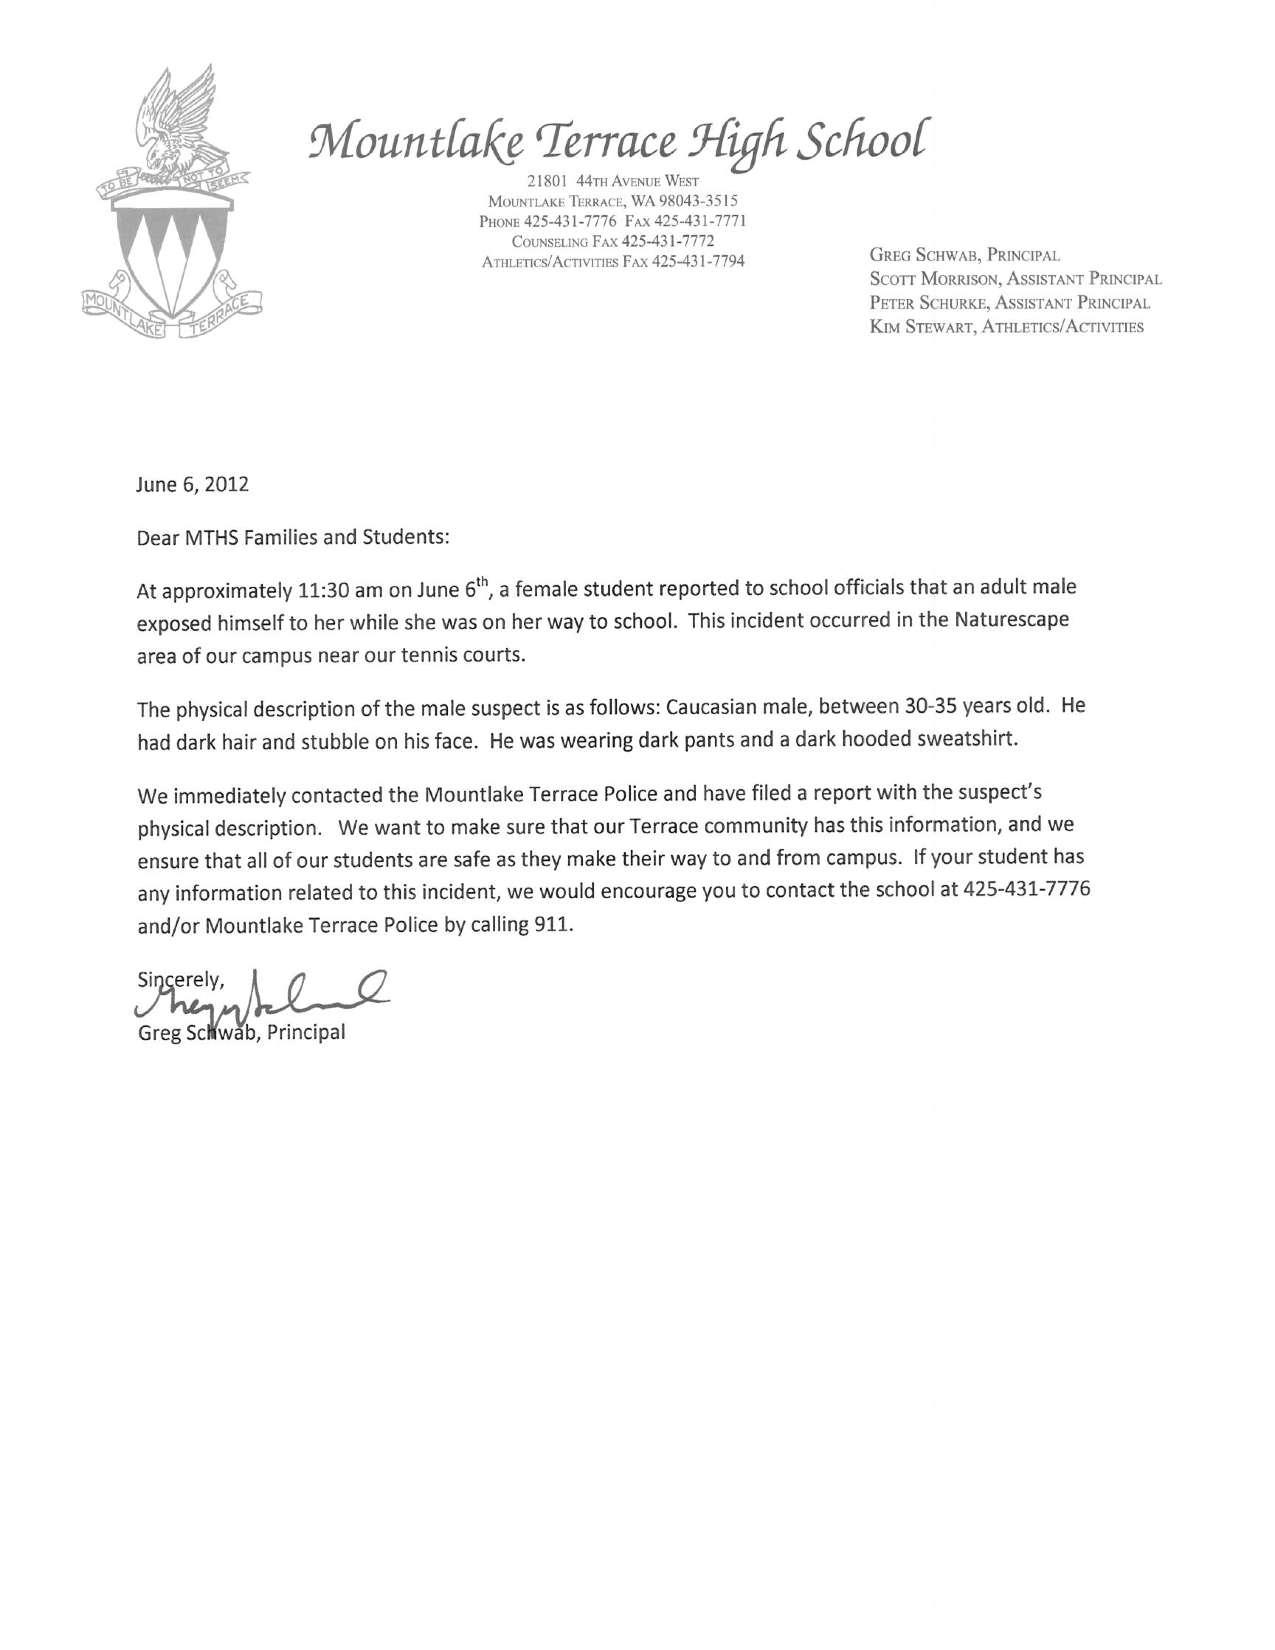 Letters To Principal Grude Interpretomics Co